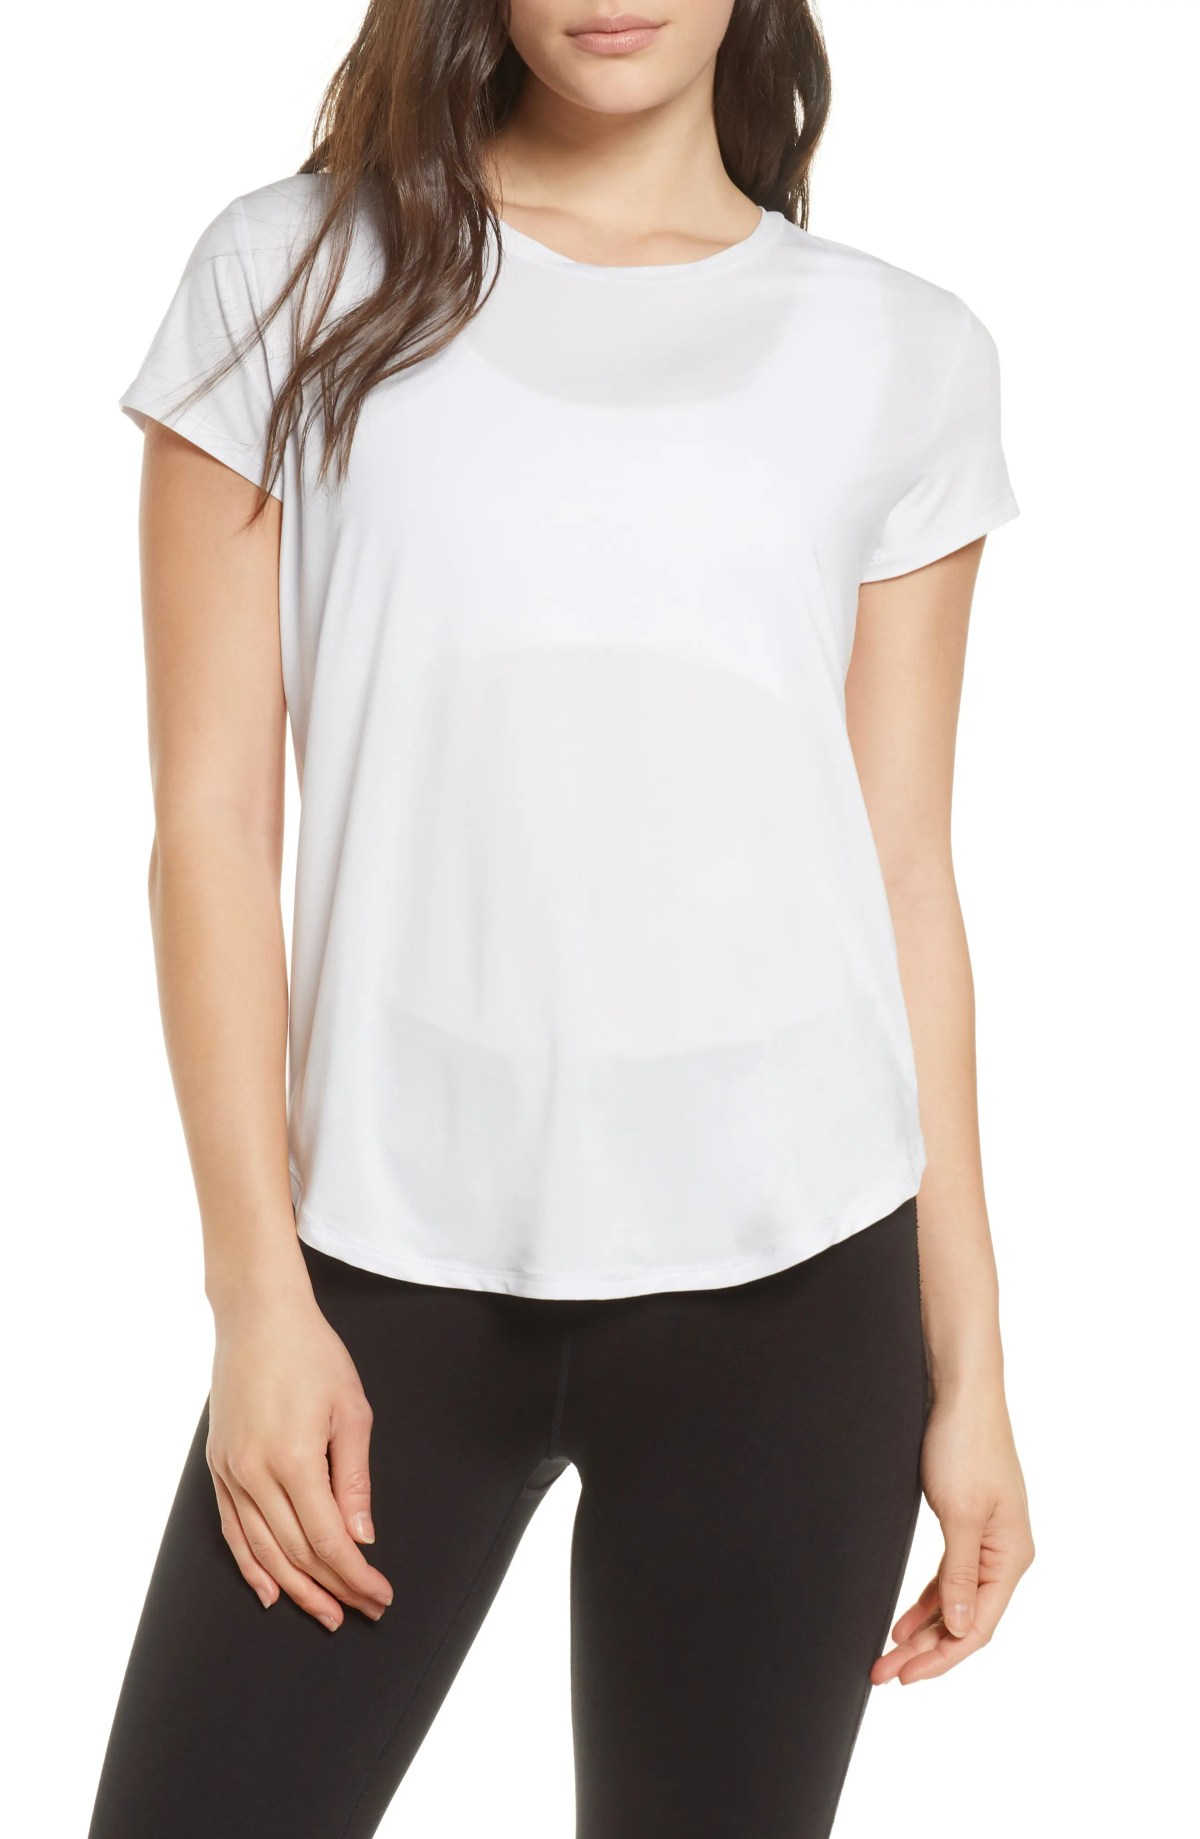 ZELLA Strength Performance T-Shirt, Main, color, PURPLE HINT